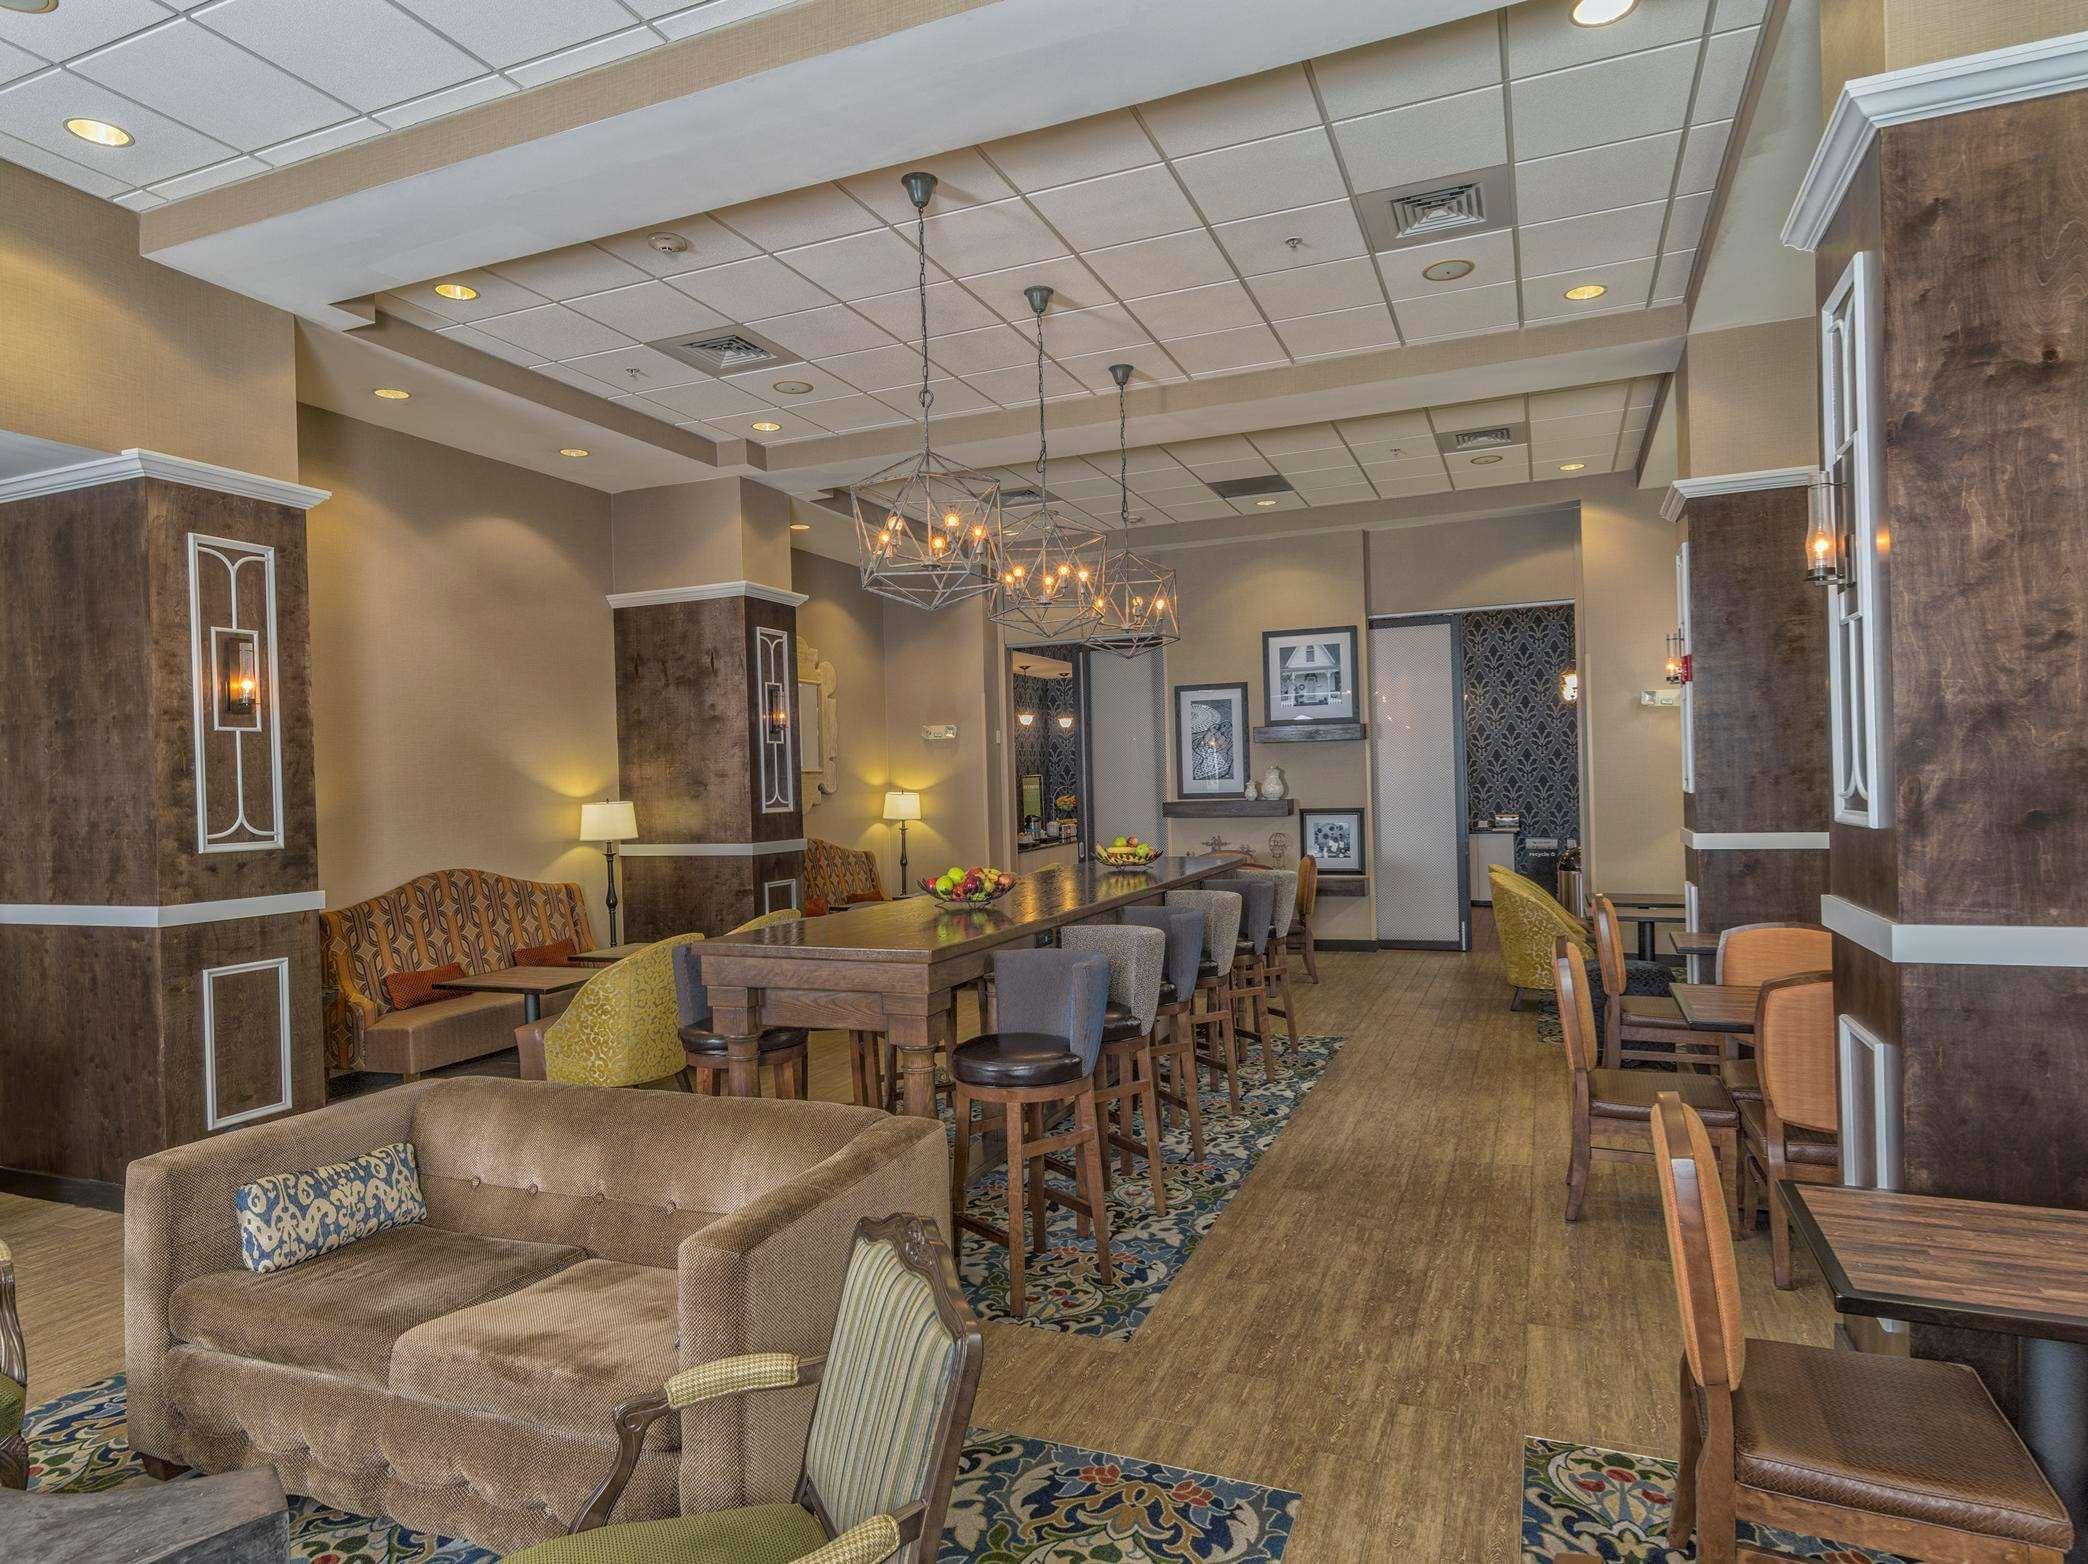 Motels On Wilkinson Blvd In Charlotte Nc